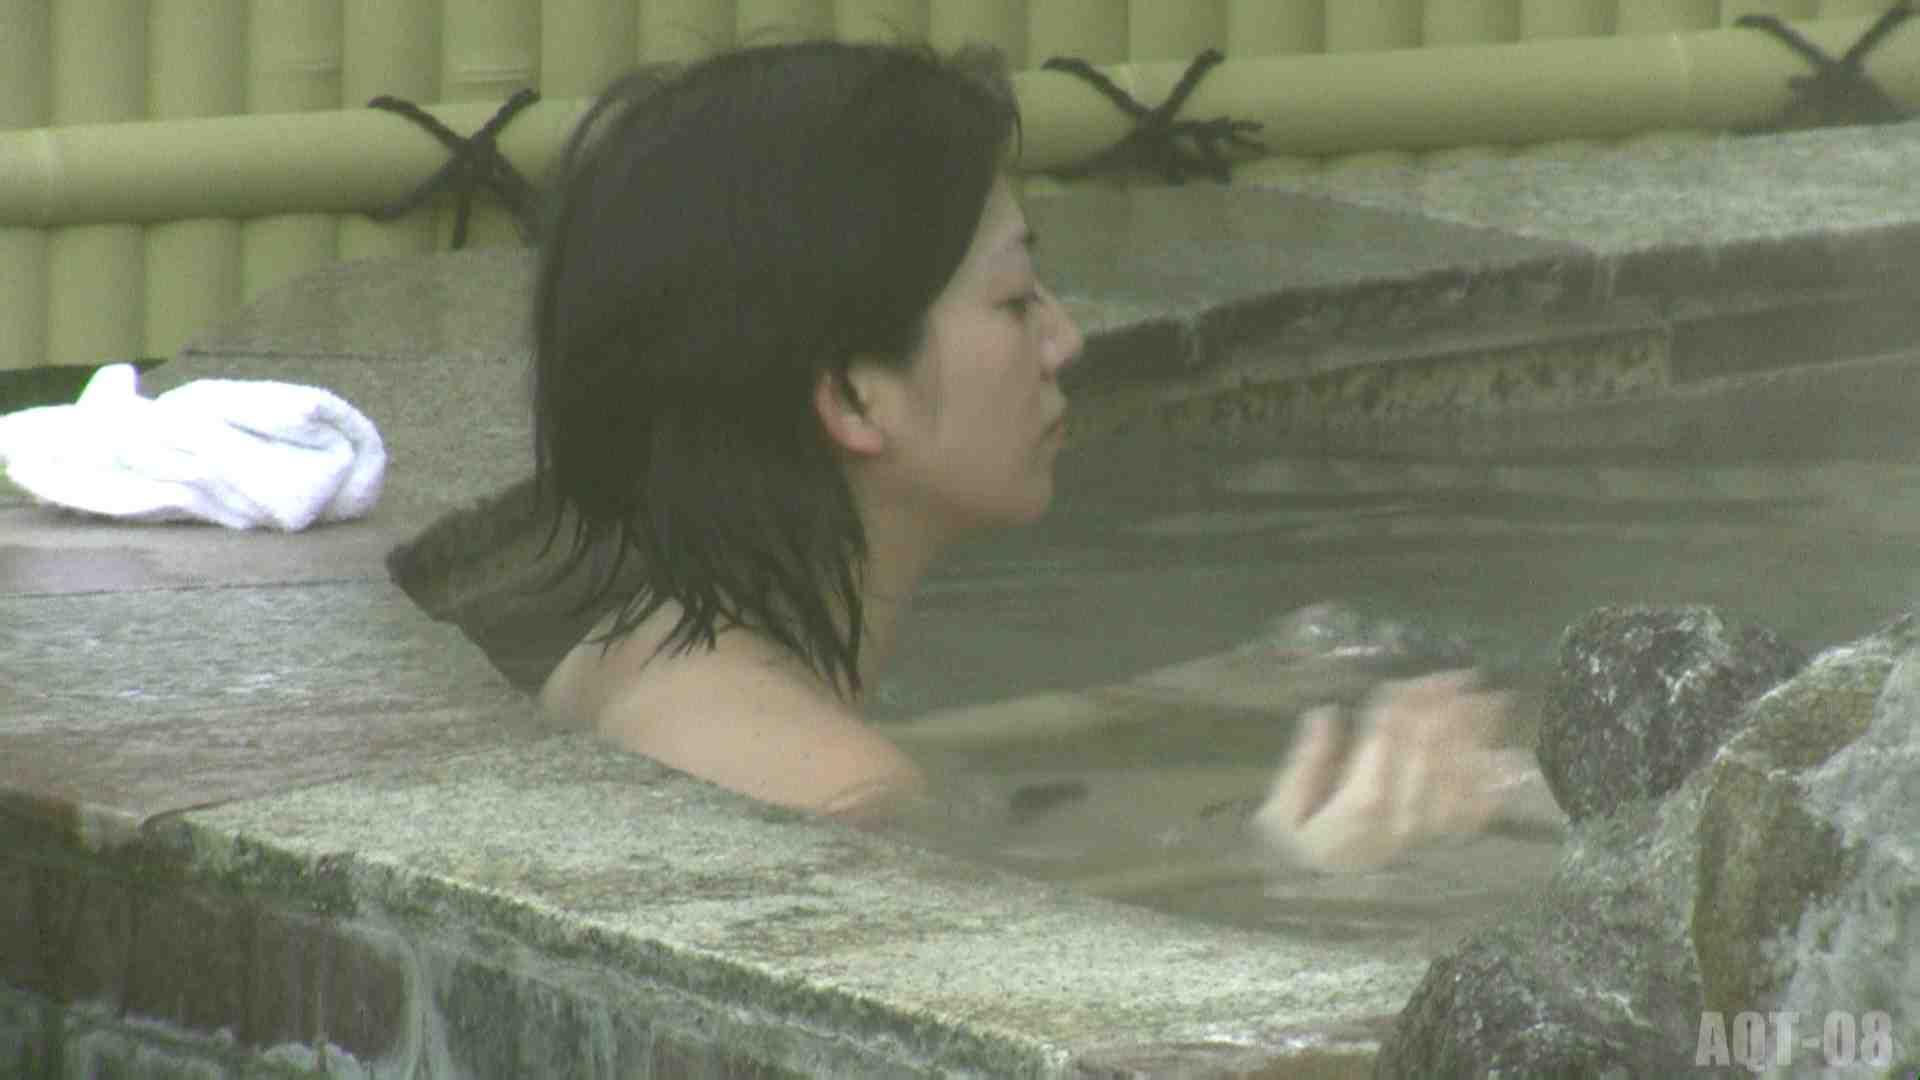 Aquaな露天風呂Vol.776 露天 | OLセックス  108画像 67